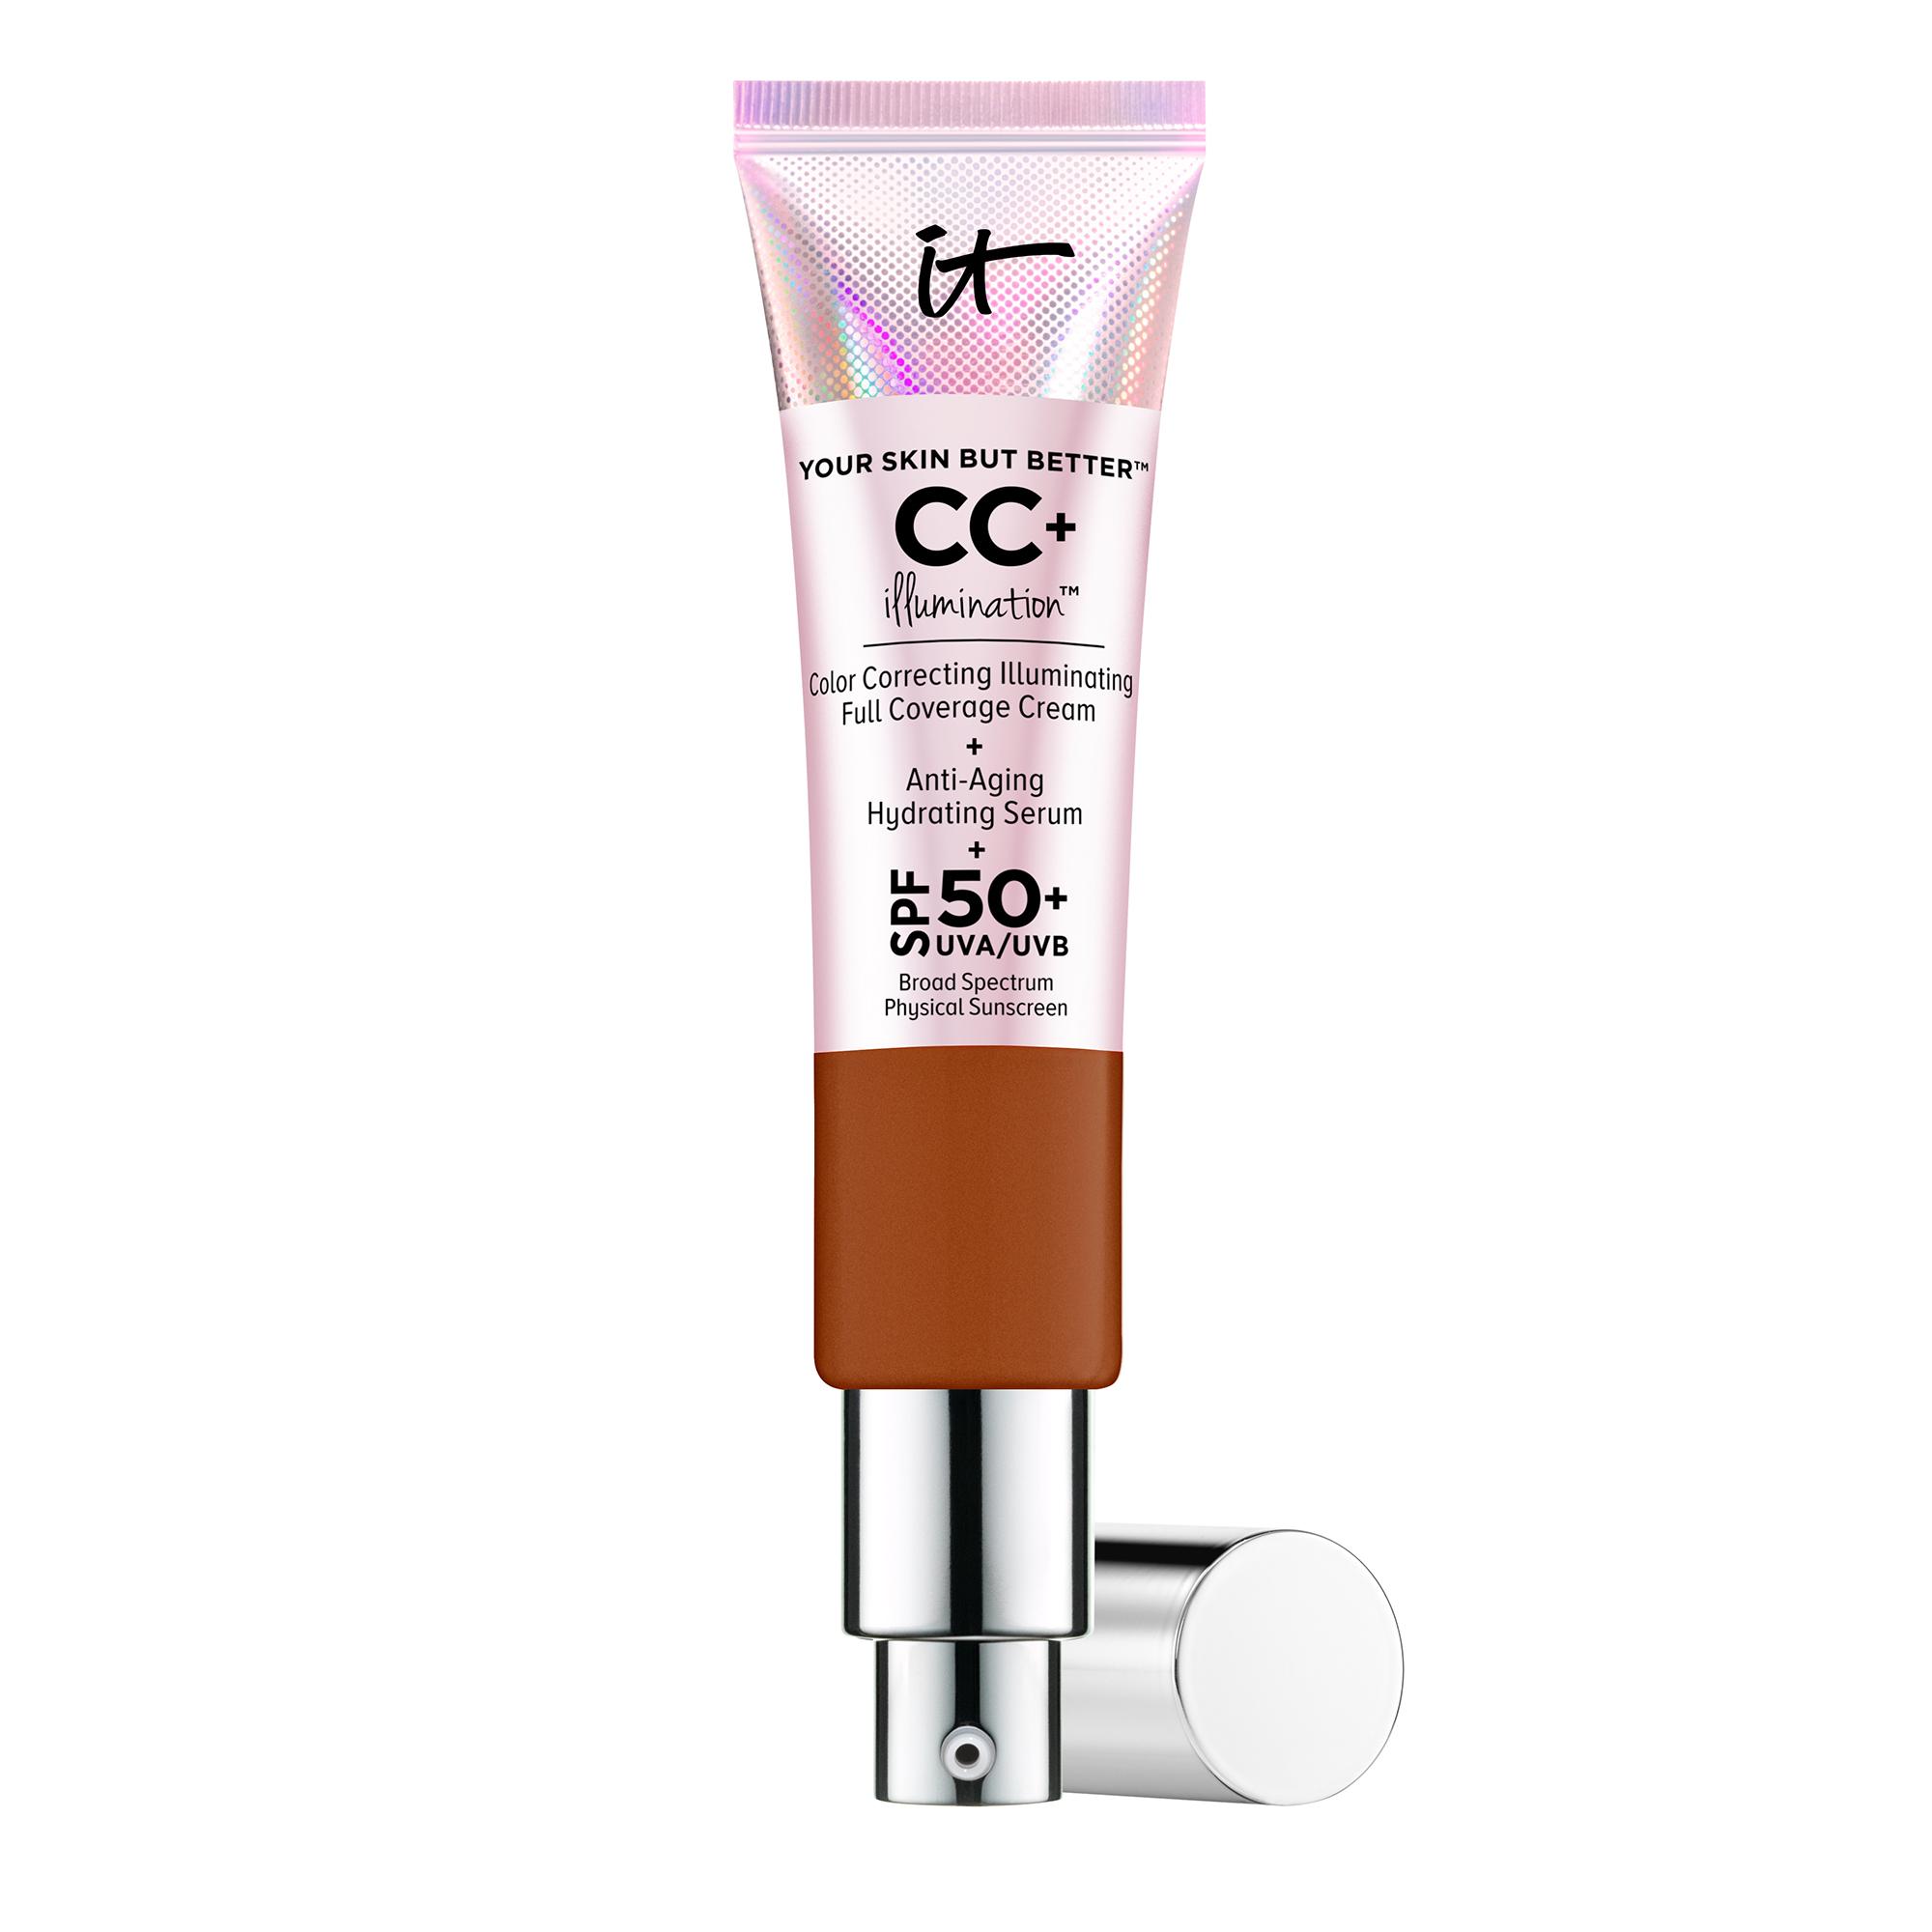 Your Skin But Better™ CC+ Illumination™ SPF 50+ Rich Honey